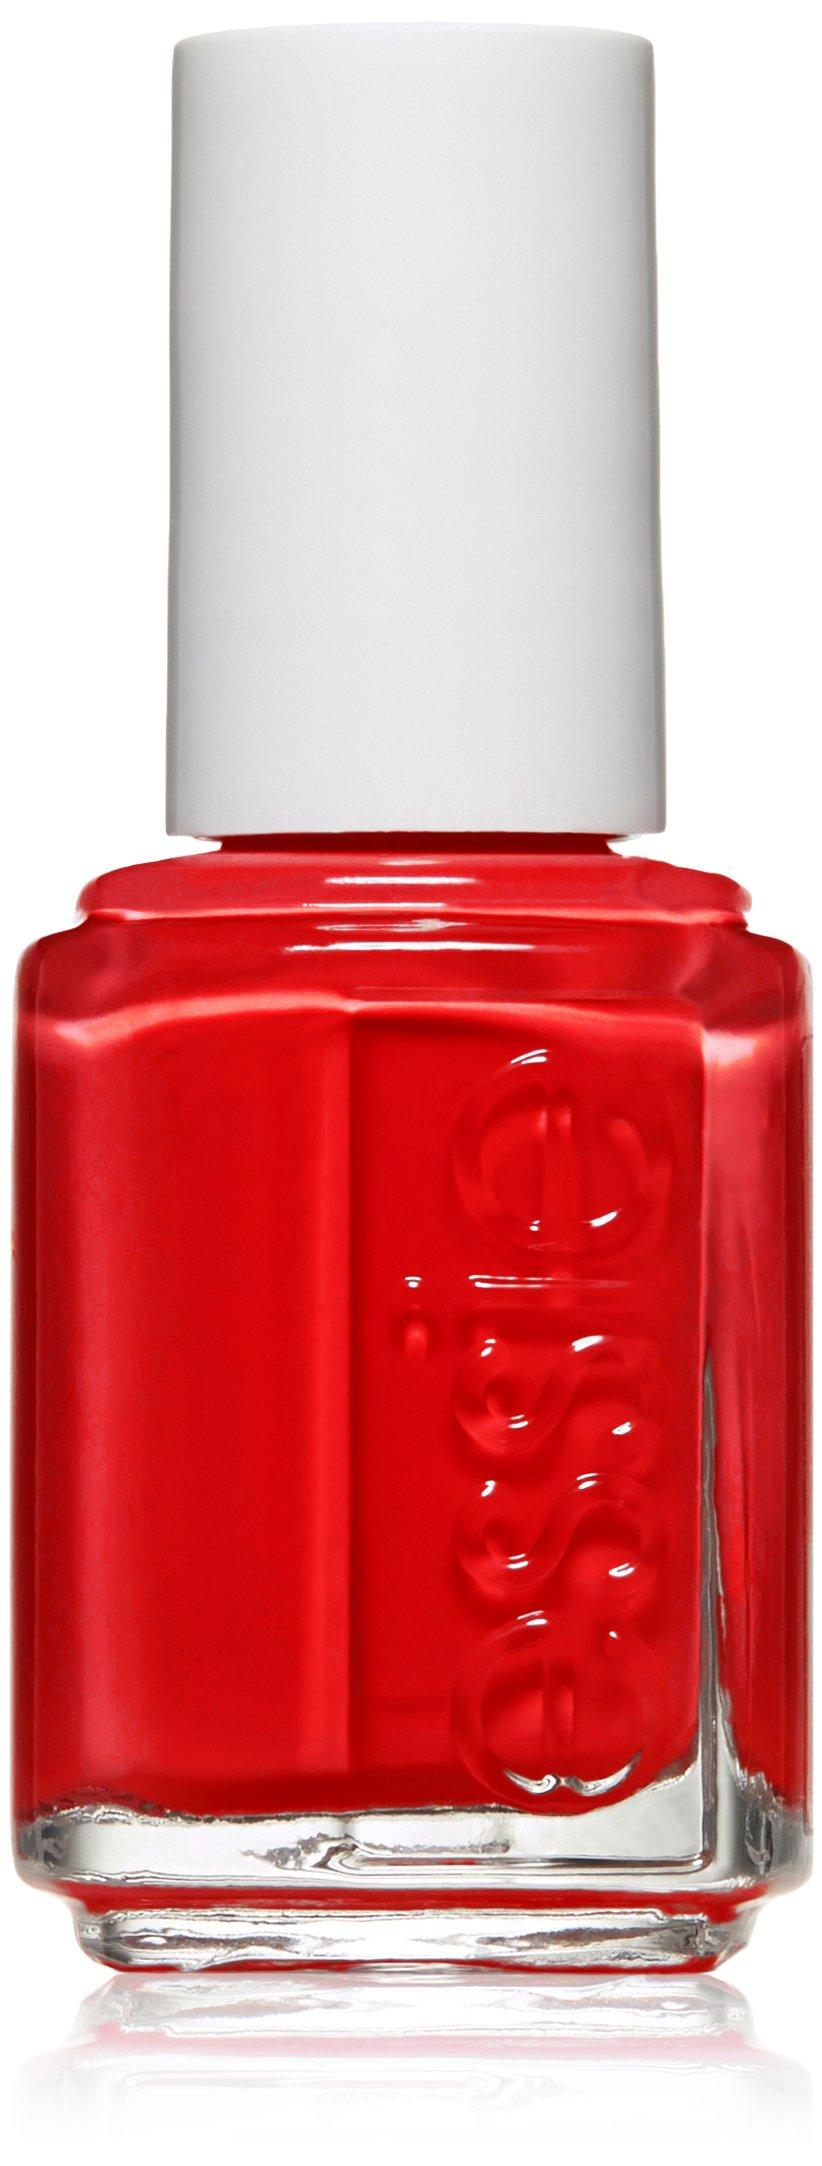 Essie Nail Polish Fifth Avenue- HireAbility